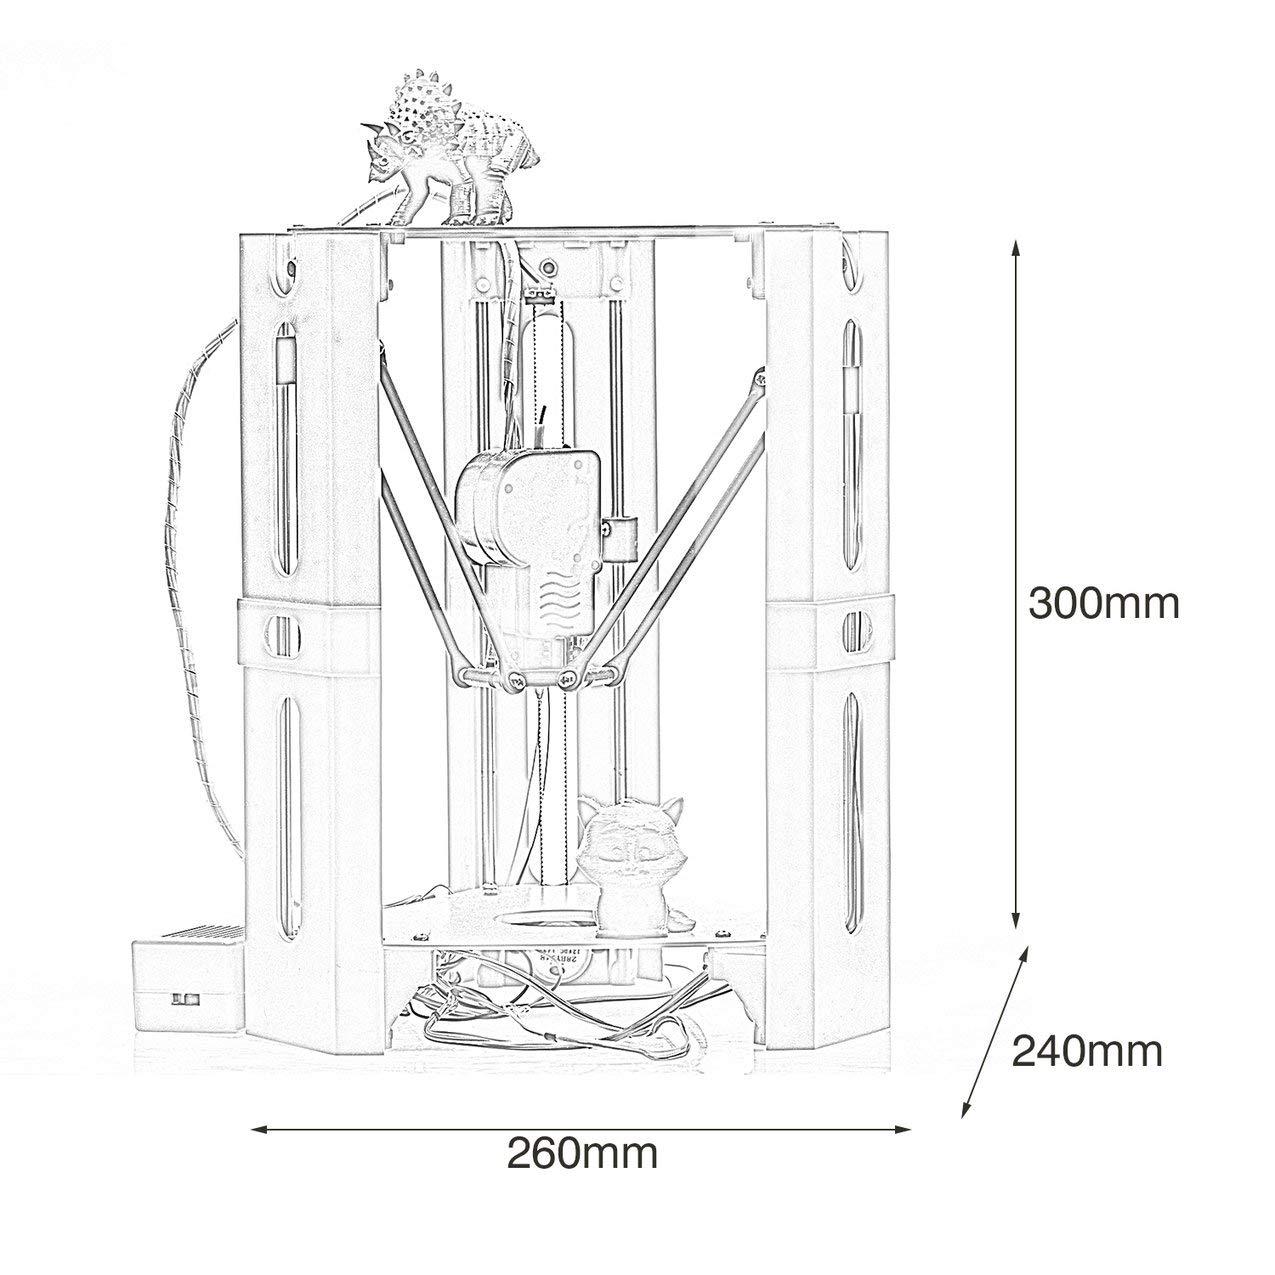 Kit de impresora USB de alta precisión DIY Desktop Impresión 3D ...